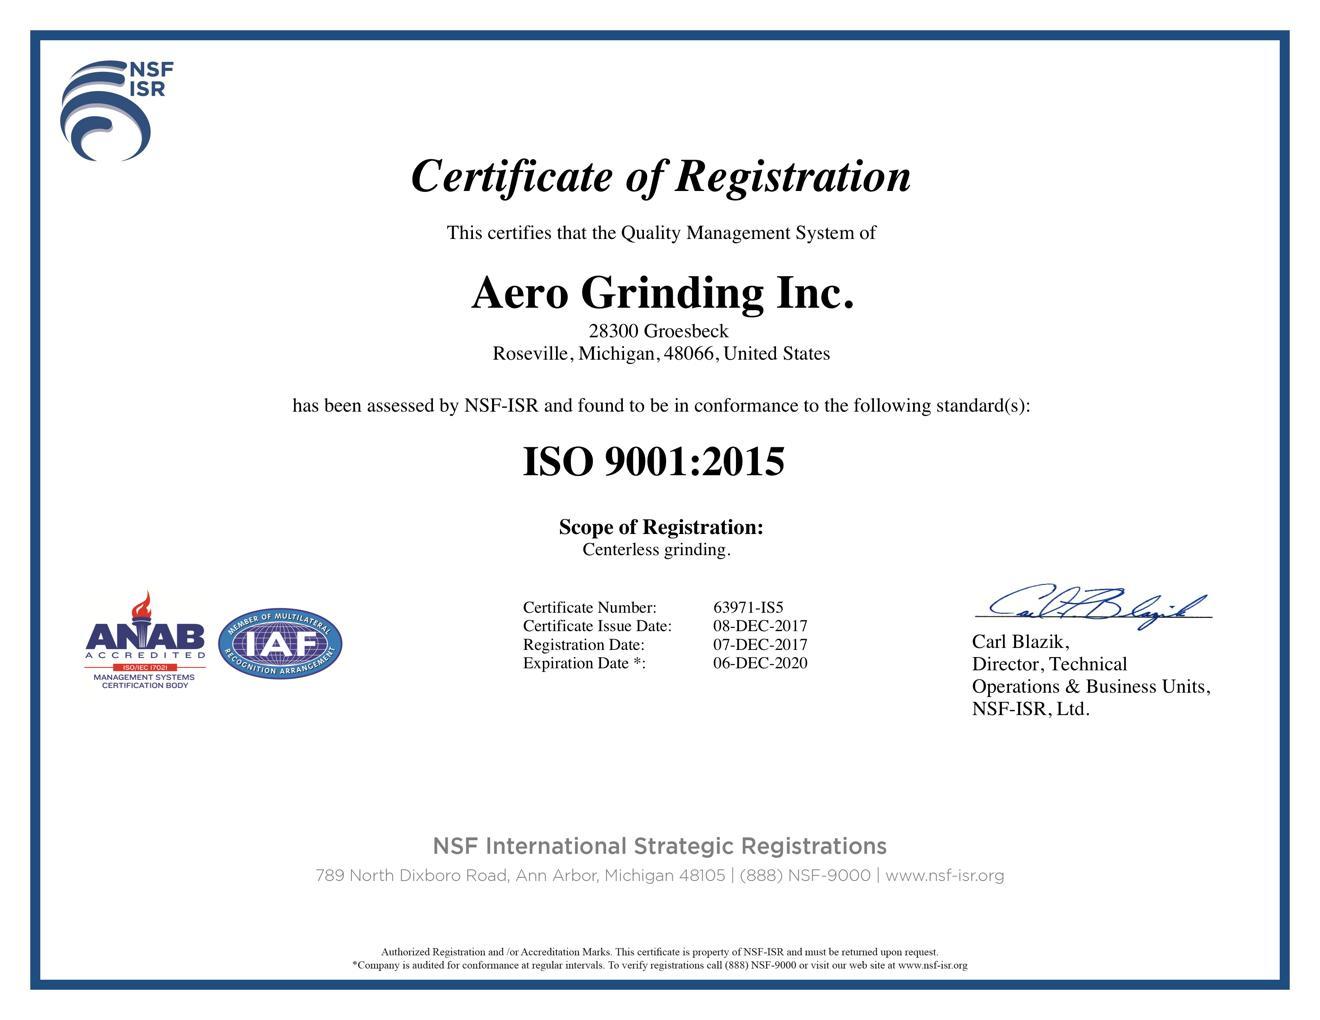 aero grinding iso certificate